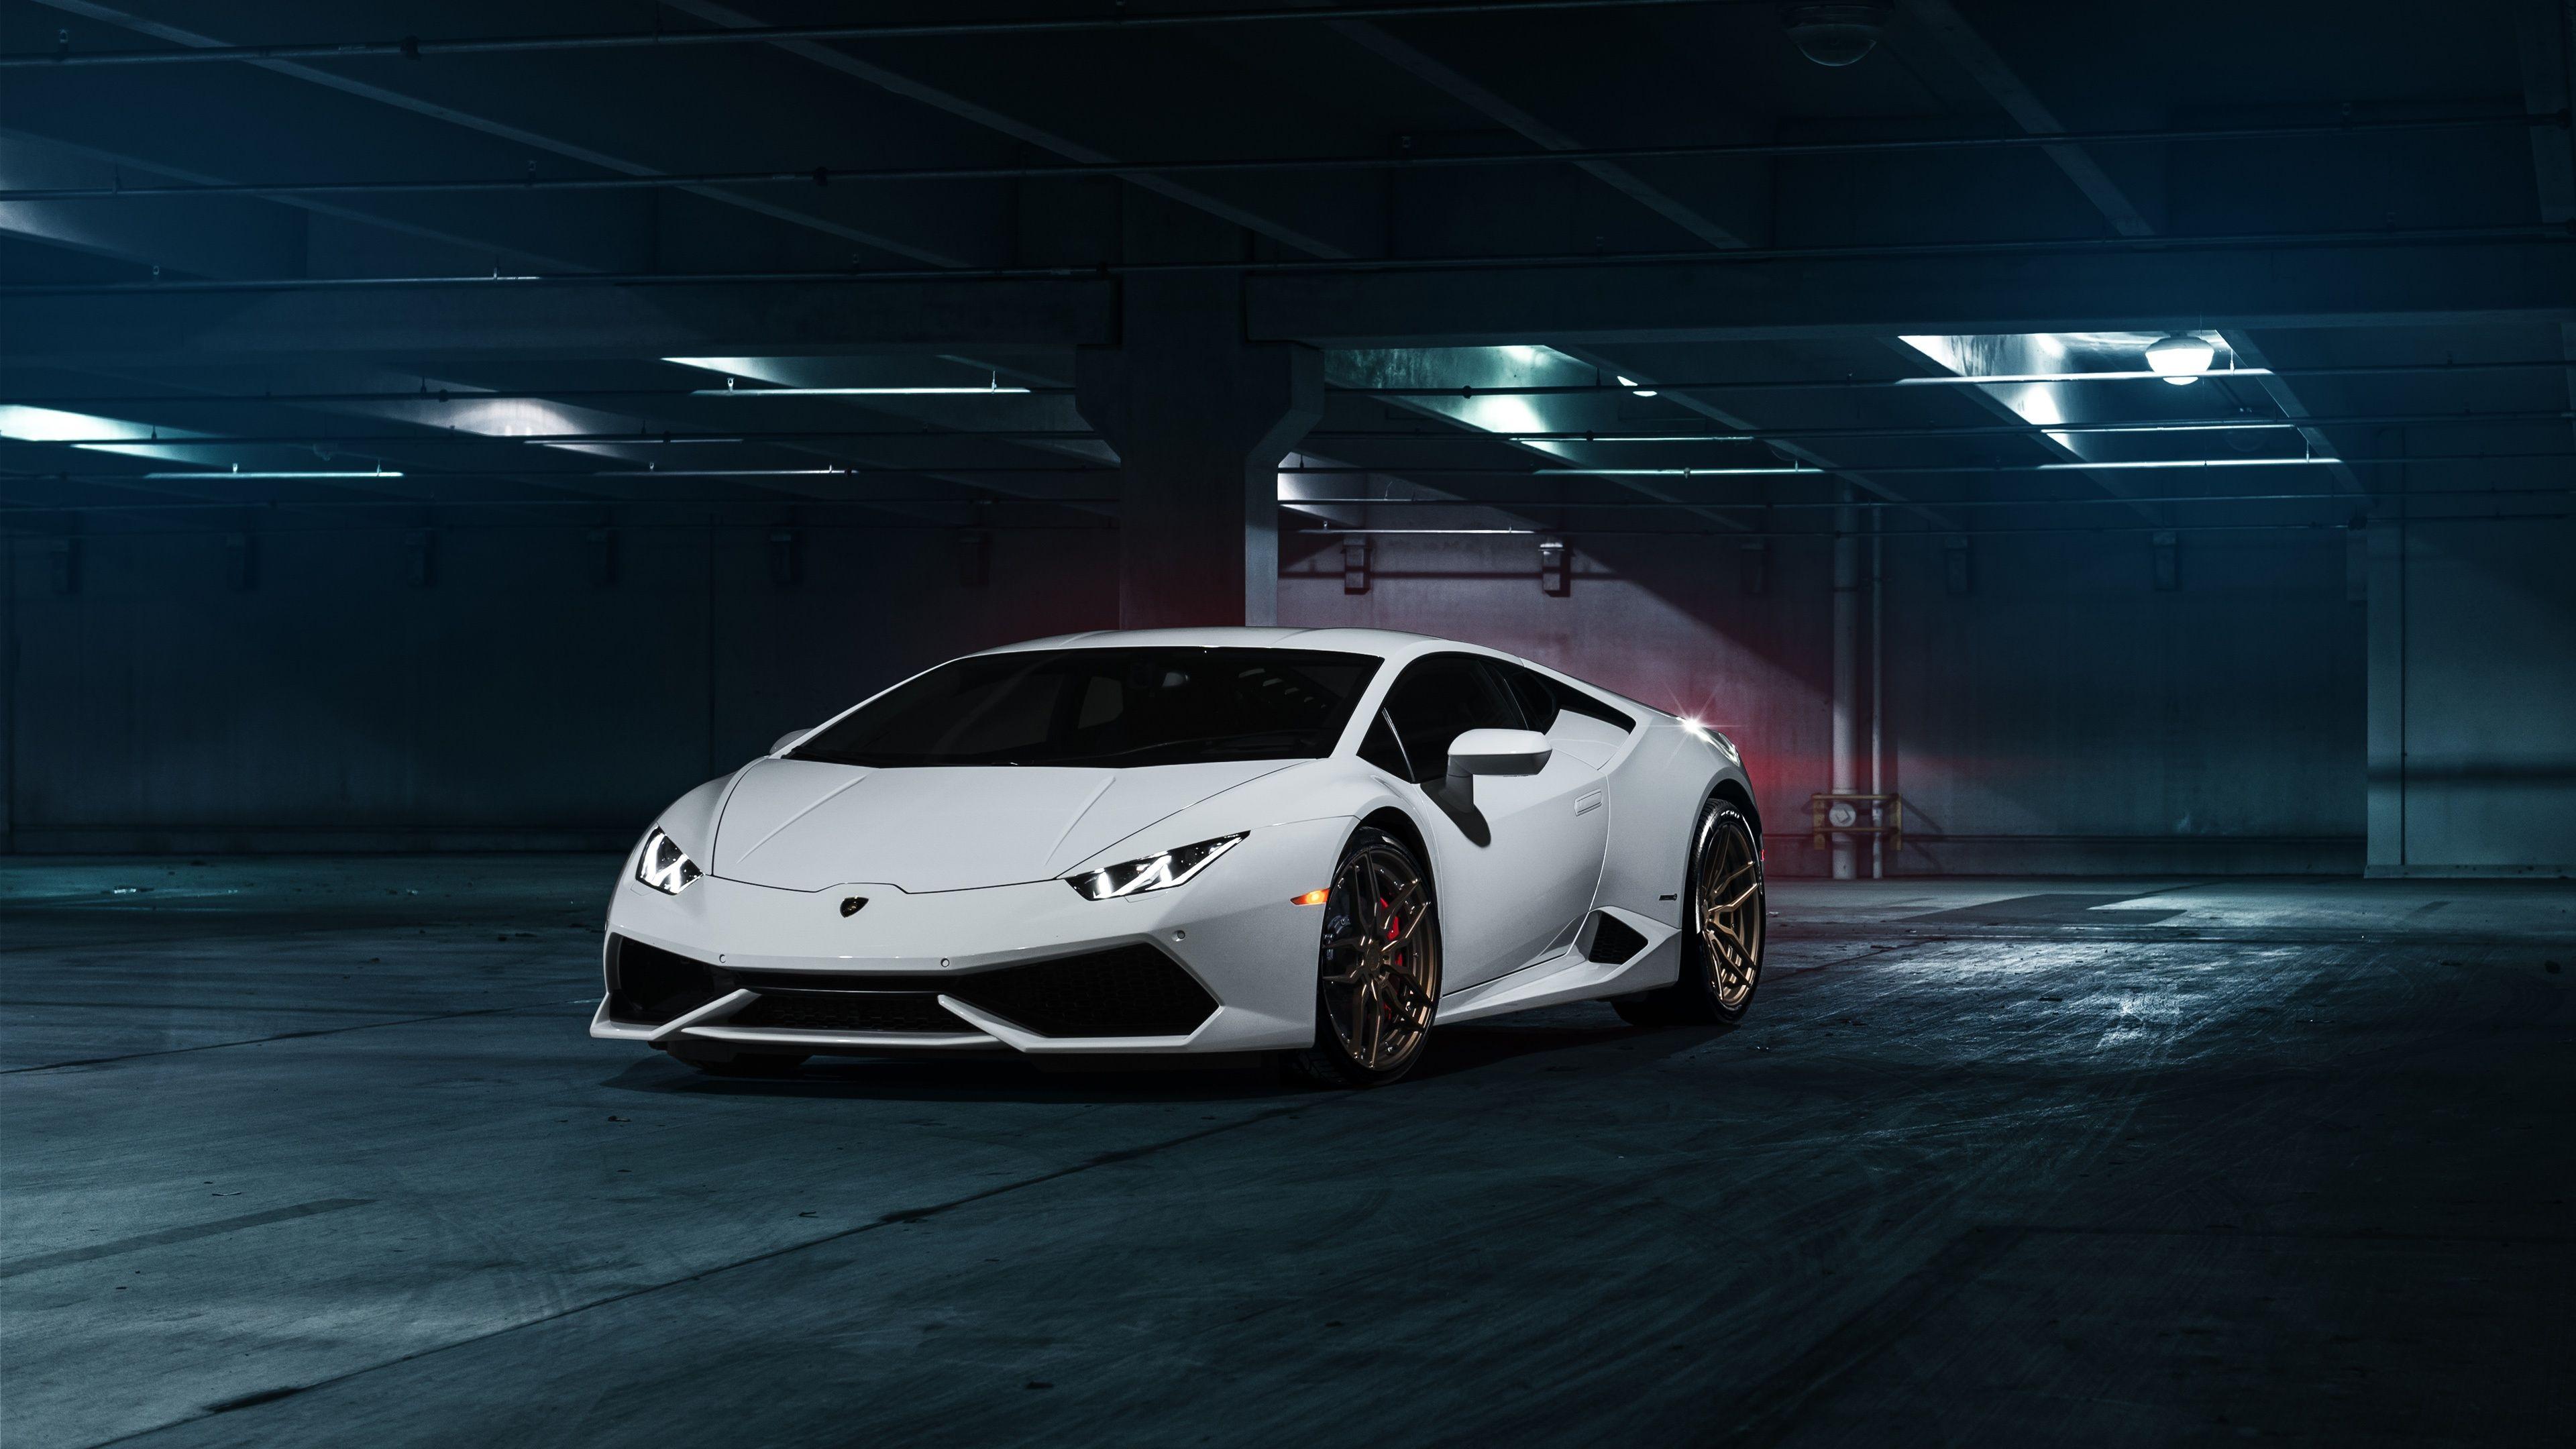 e92ef71f125477b6df08f998aa787cc2 Marvelous Lamborghini Huracan Hack asphalt 8 Cars Trend